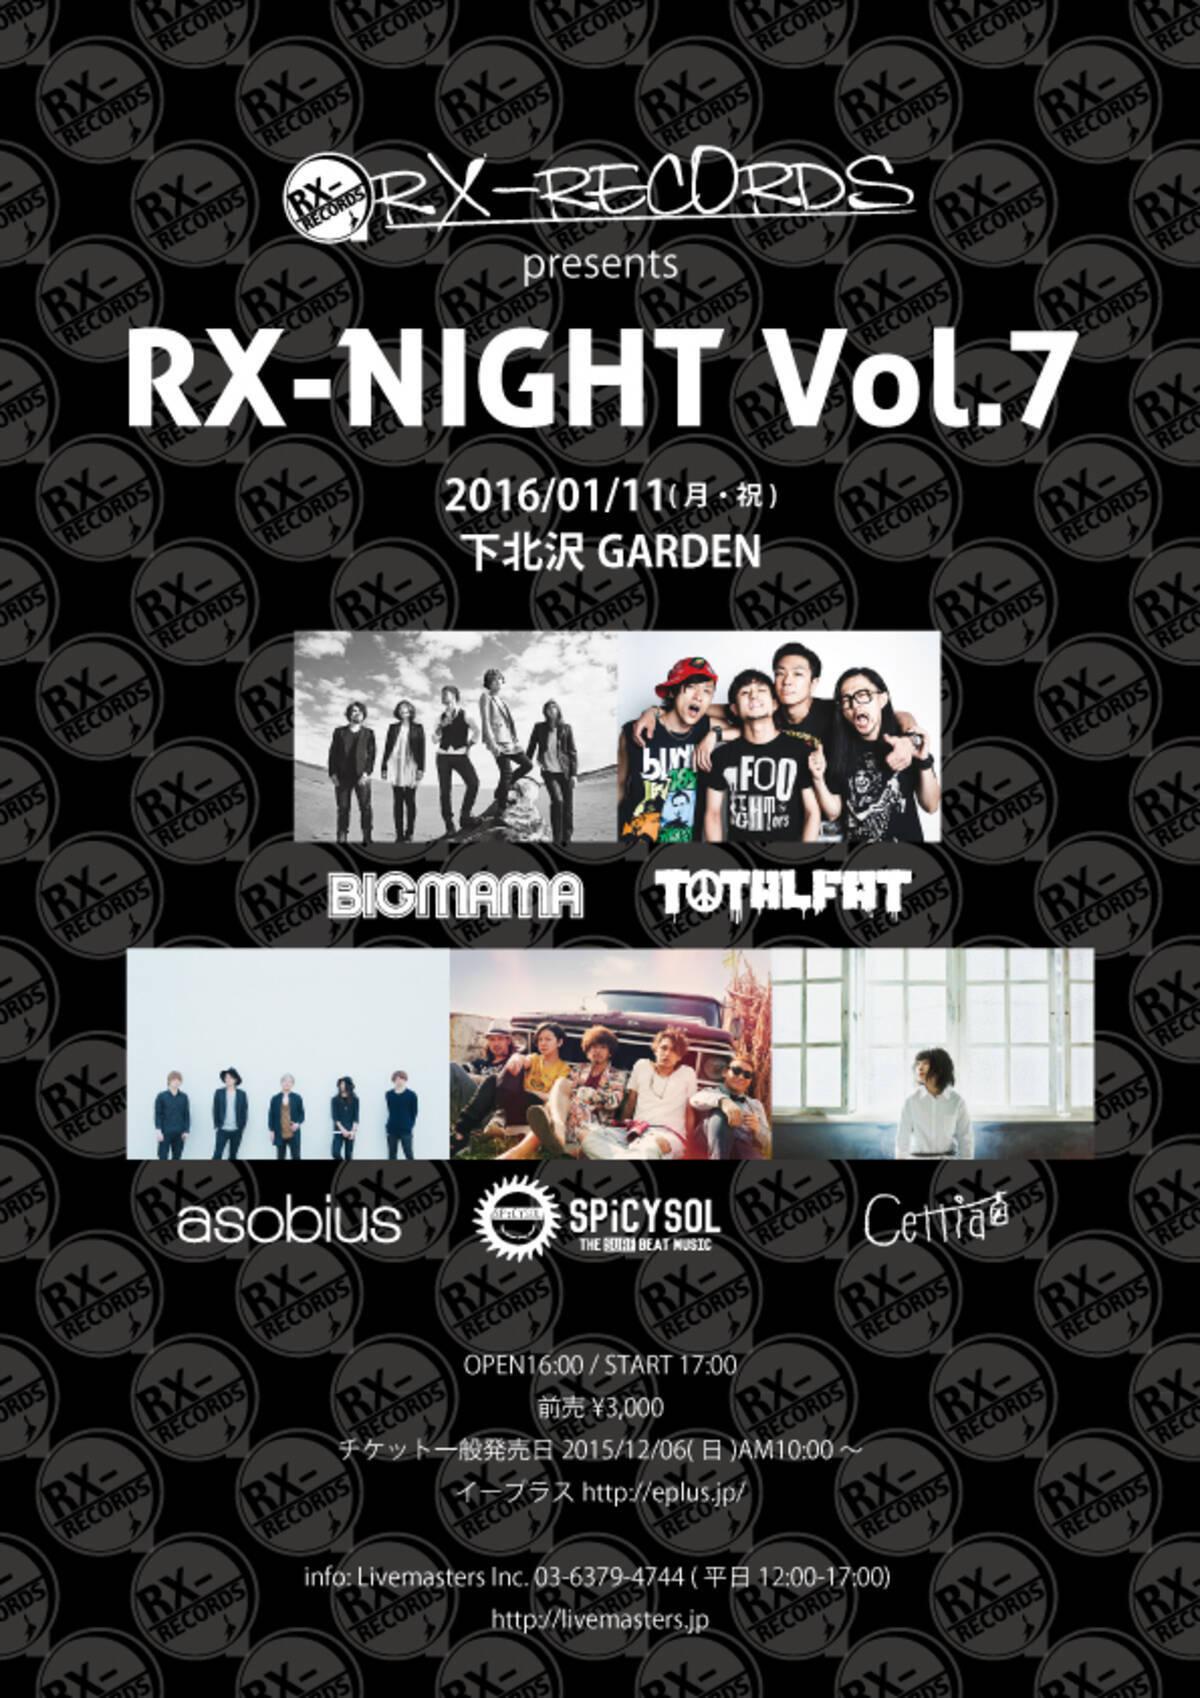 Totalfat Bigmamaらが出演 Rx Night Vol 7 が来年1月に開催決定 15年12月1日 エキサイトニュース